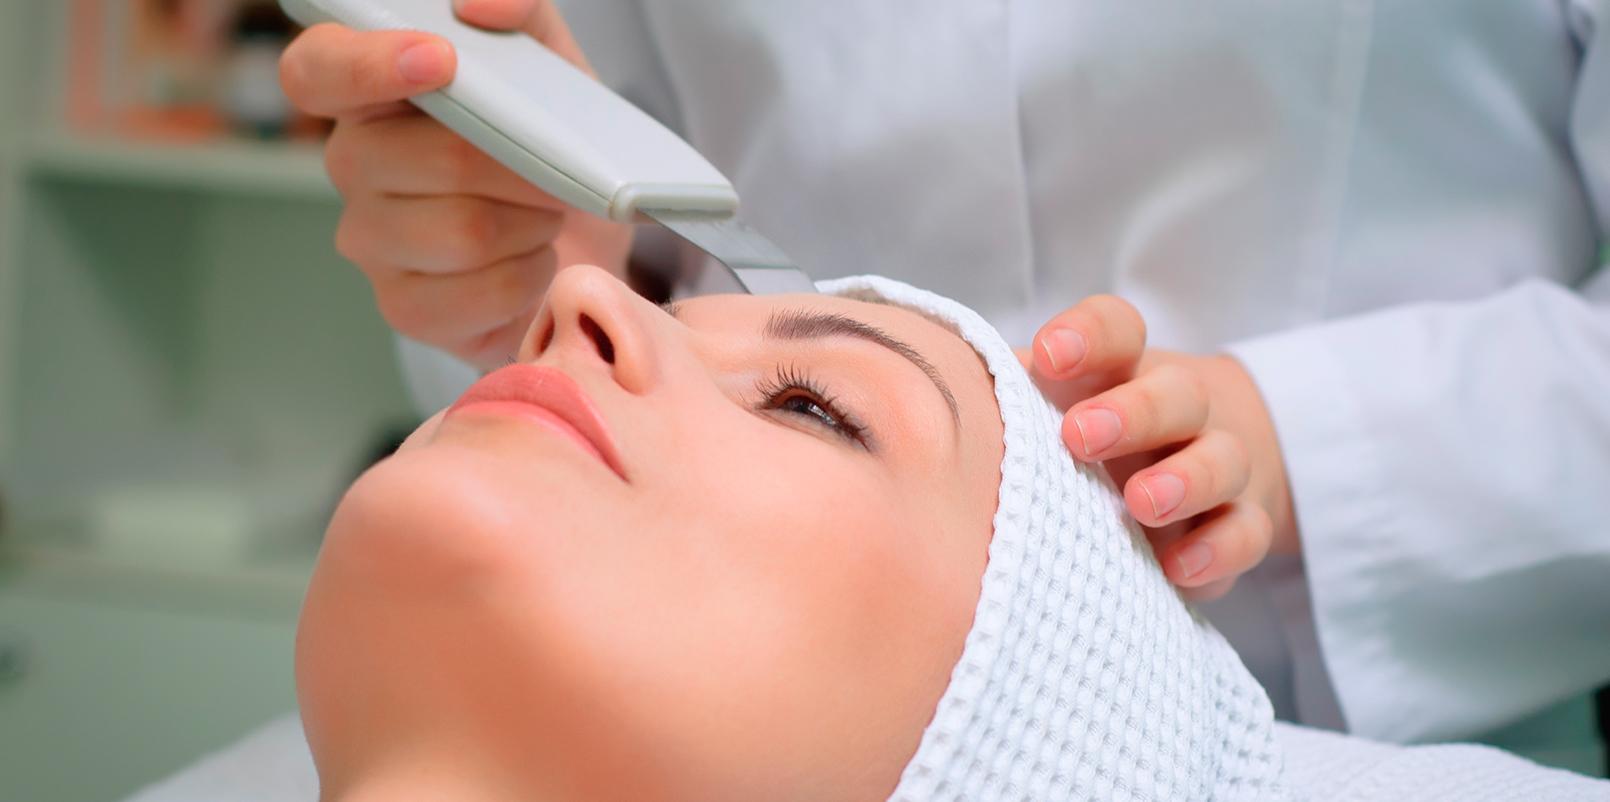 Tratamentos Estético Laser em Rio Preto - Laserterapia